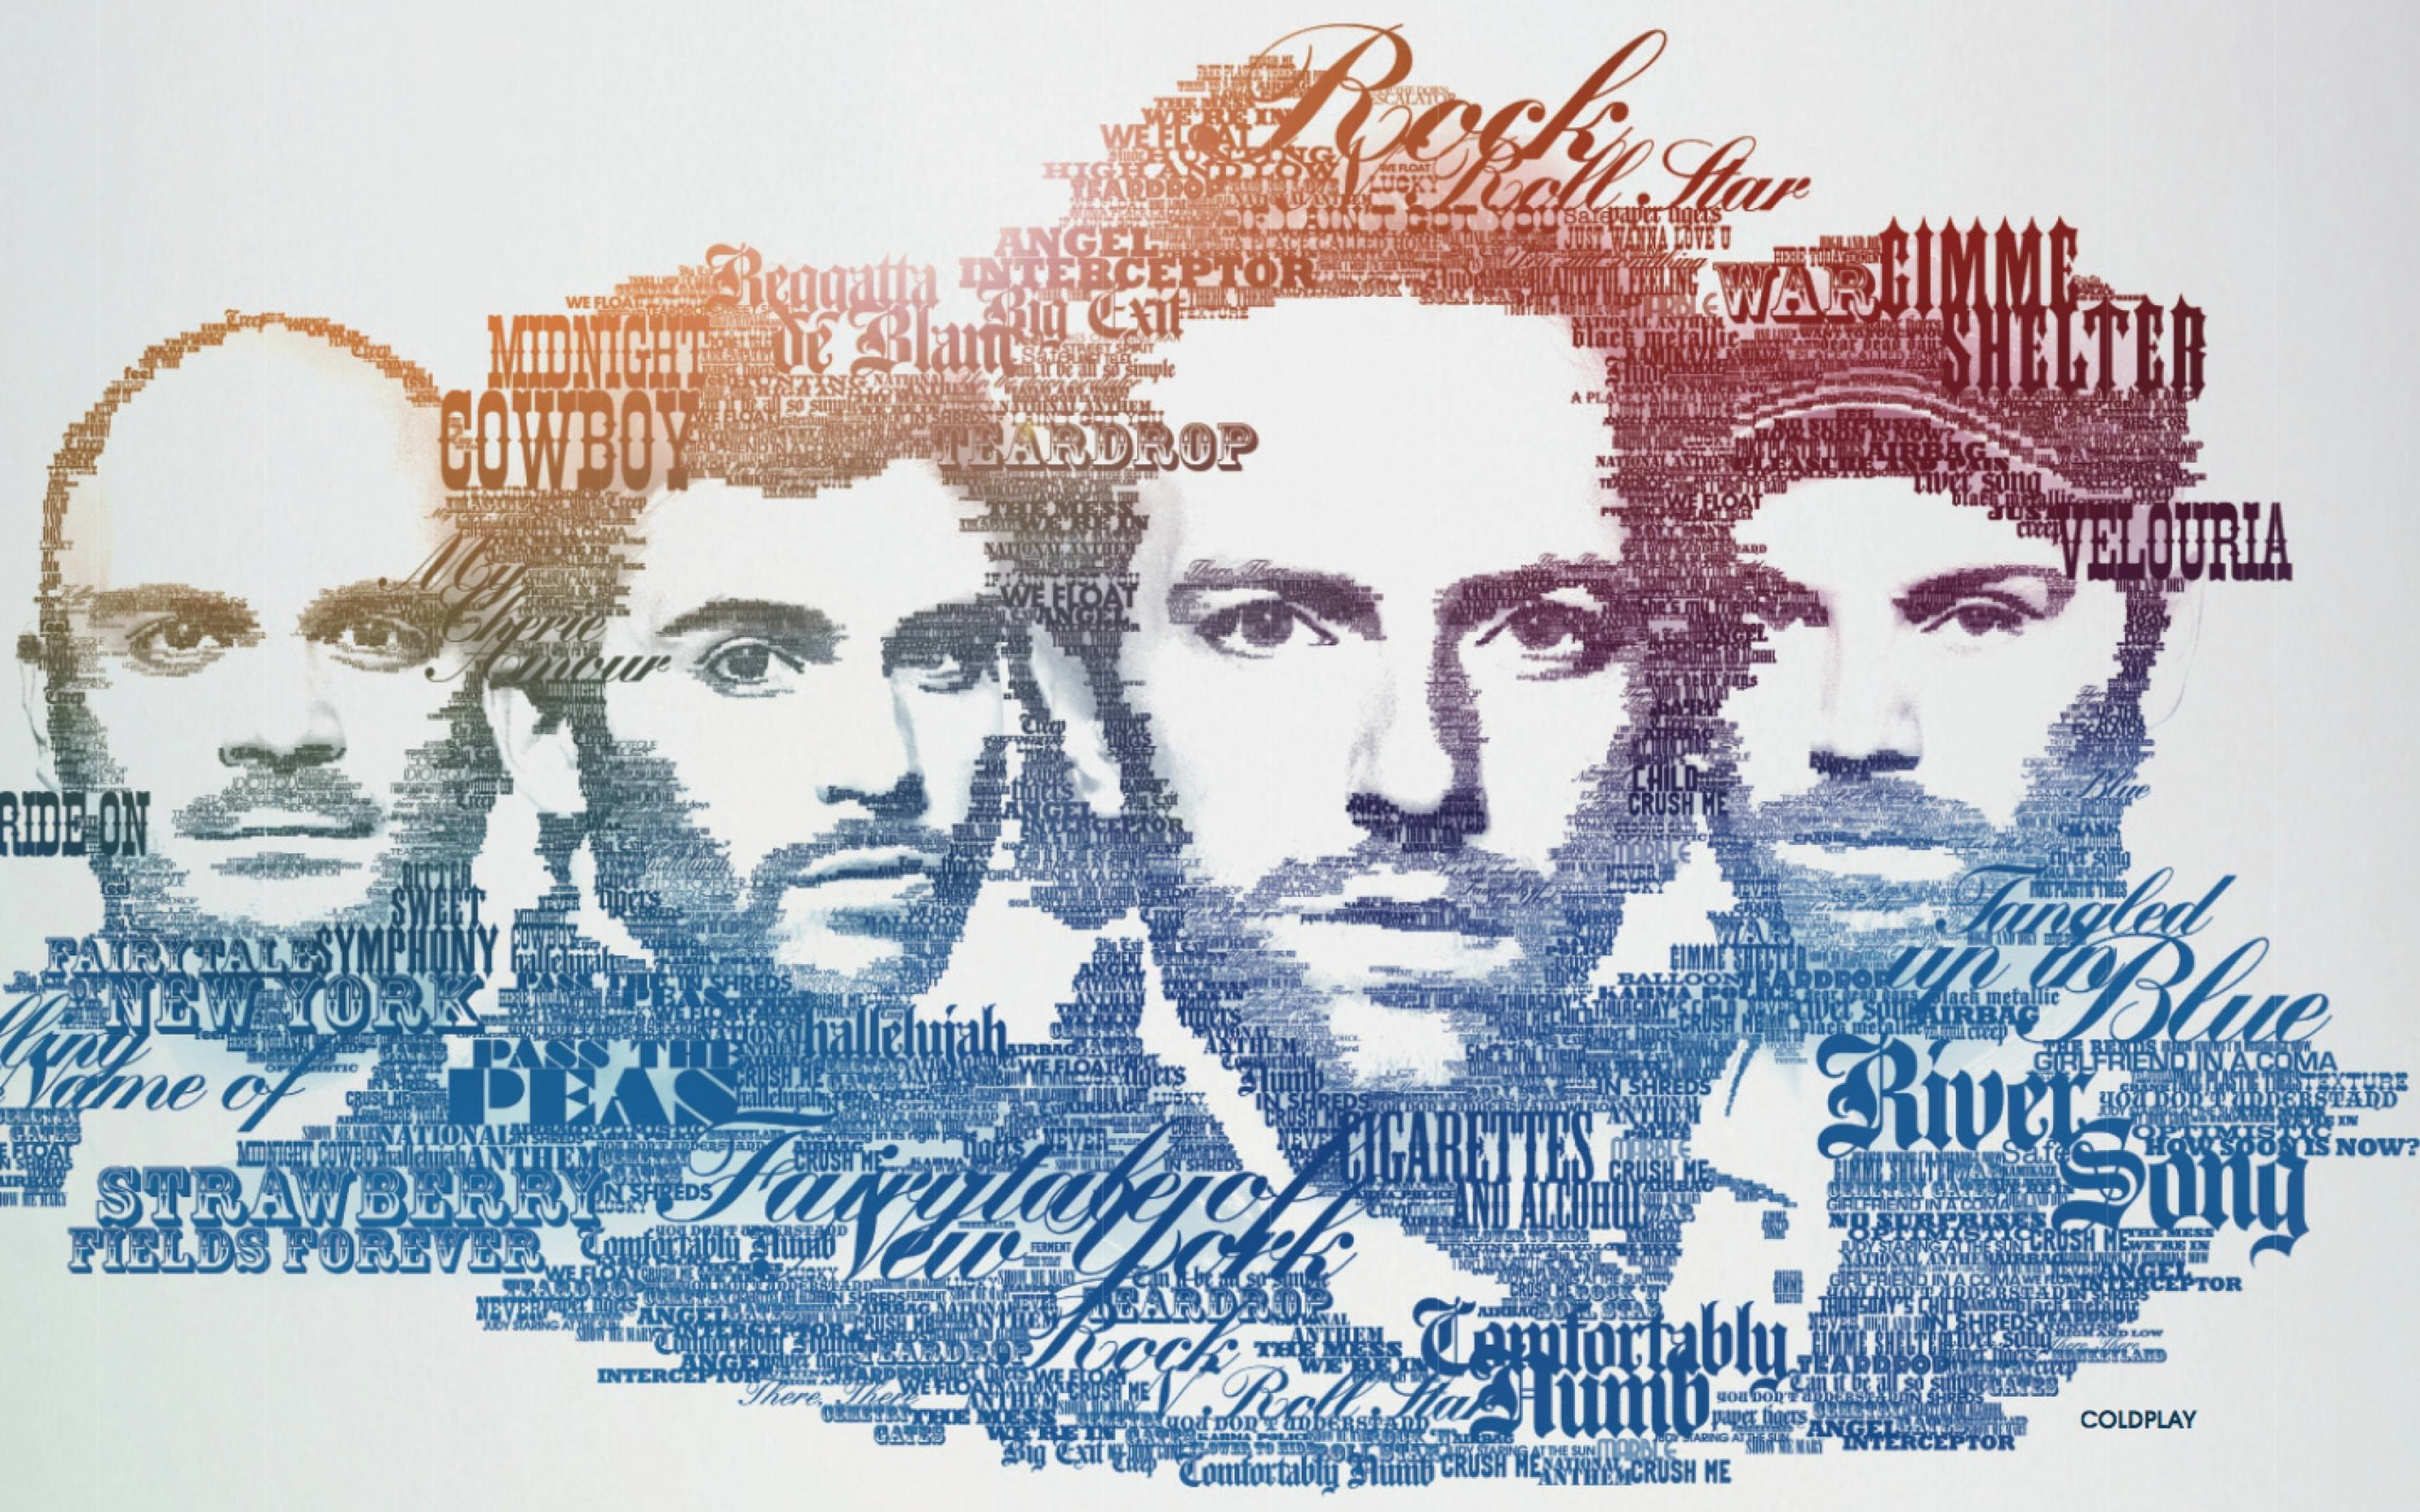 Hd wallpaper portrait - Download Coldplay Typographic Portrait Hd Wallpaper For